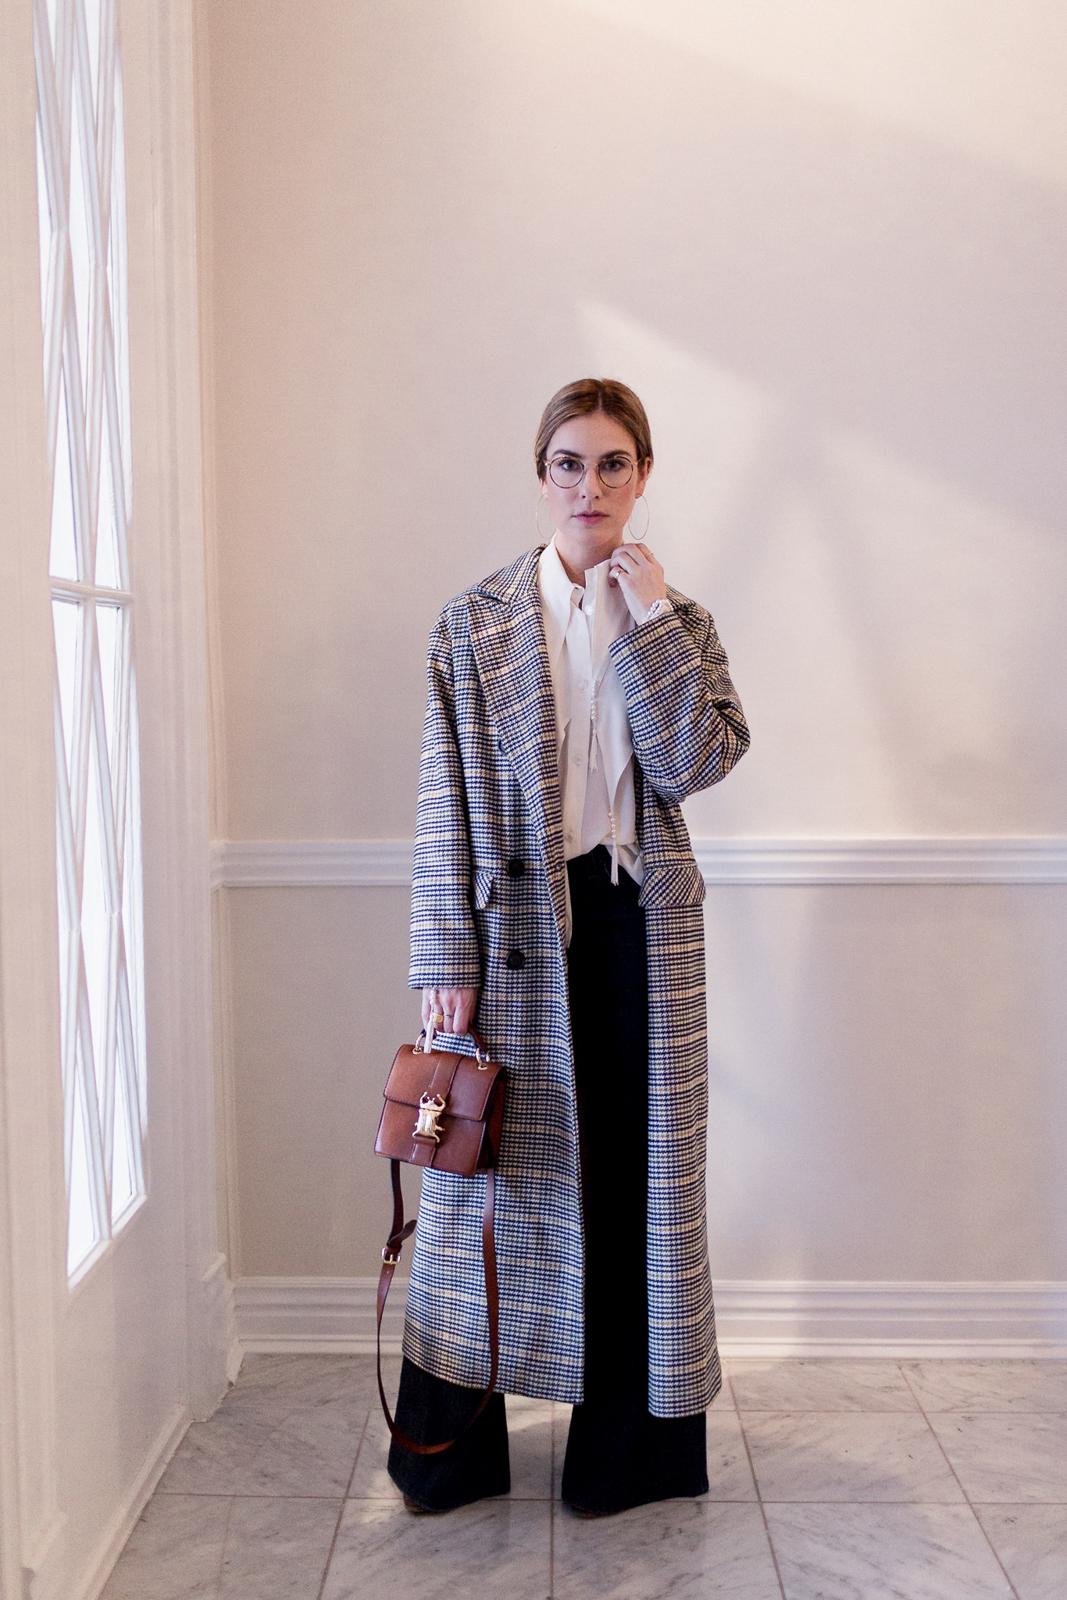 Eldridge Edit_anna_e_cottrell_fashion_blog_blogger_nordstrom_topshop_houndstooth_double_breasted_duster_coat_sale_topshop_garret_leight_glasses_thatch_lola_14k_gold_hoops_vintage_zara_bug_bag_mgb_photo_11.jpg